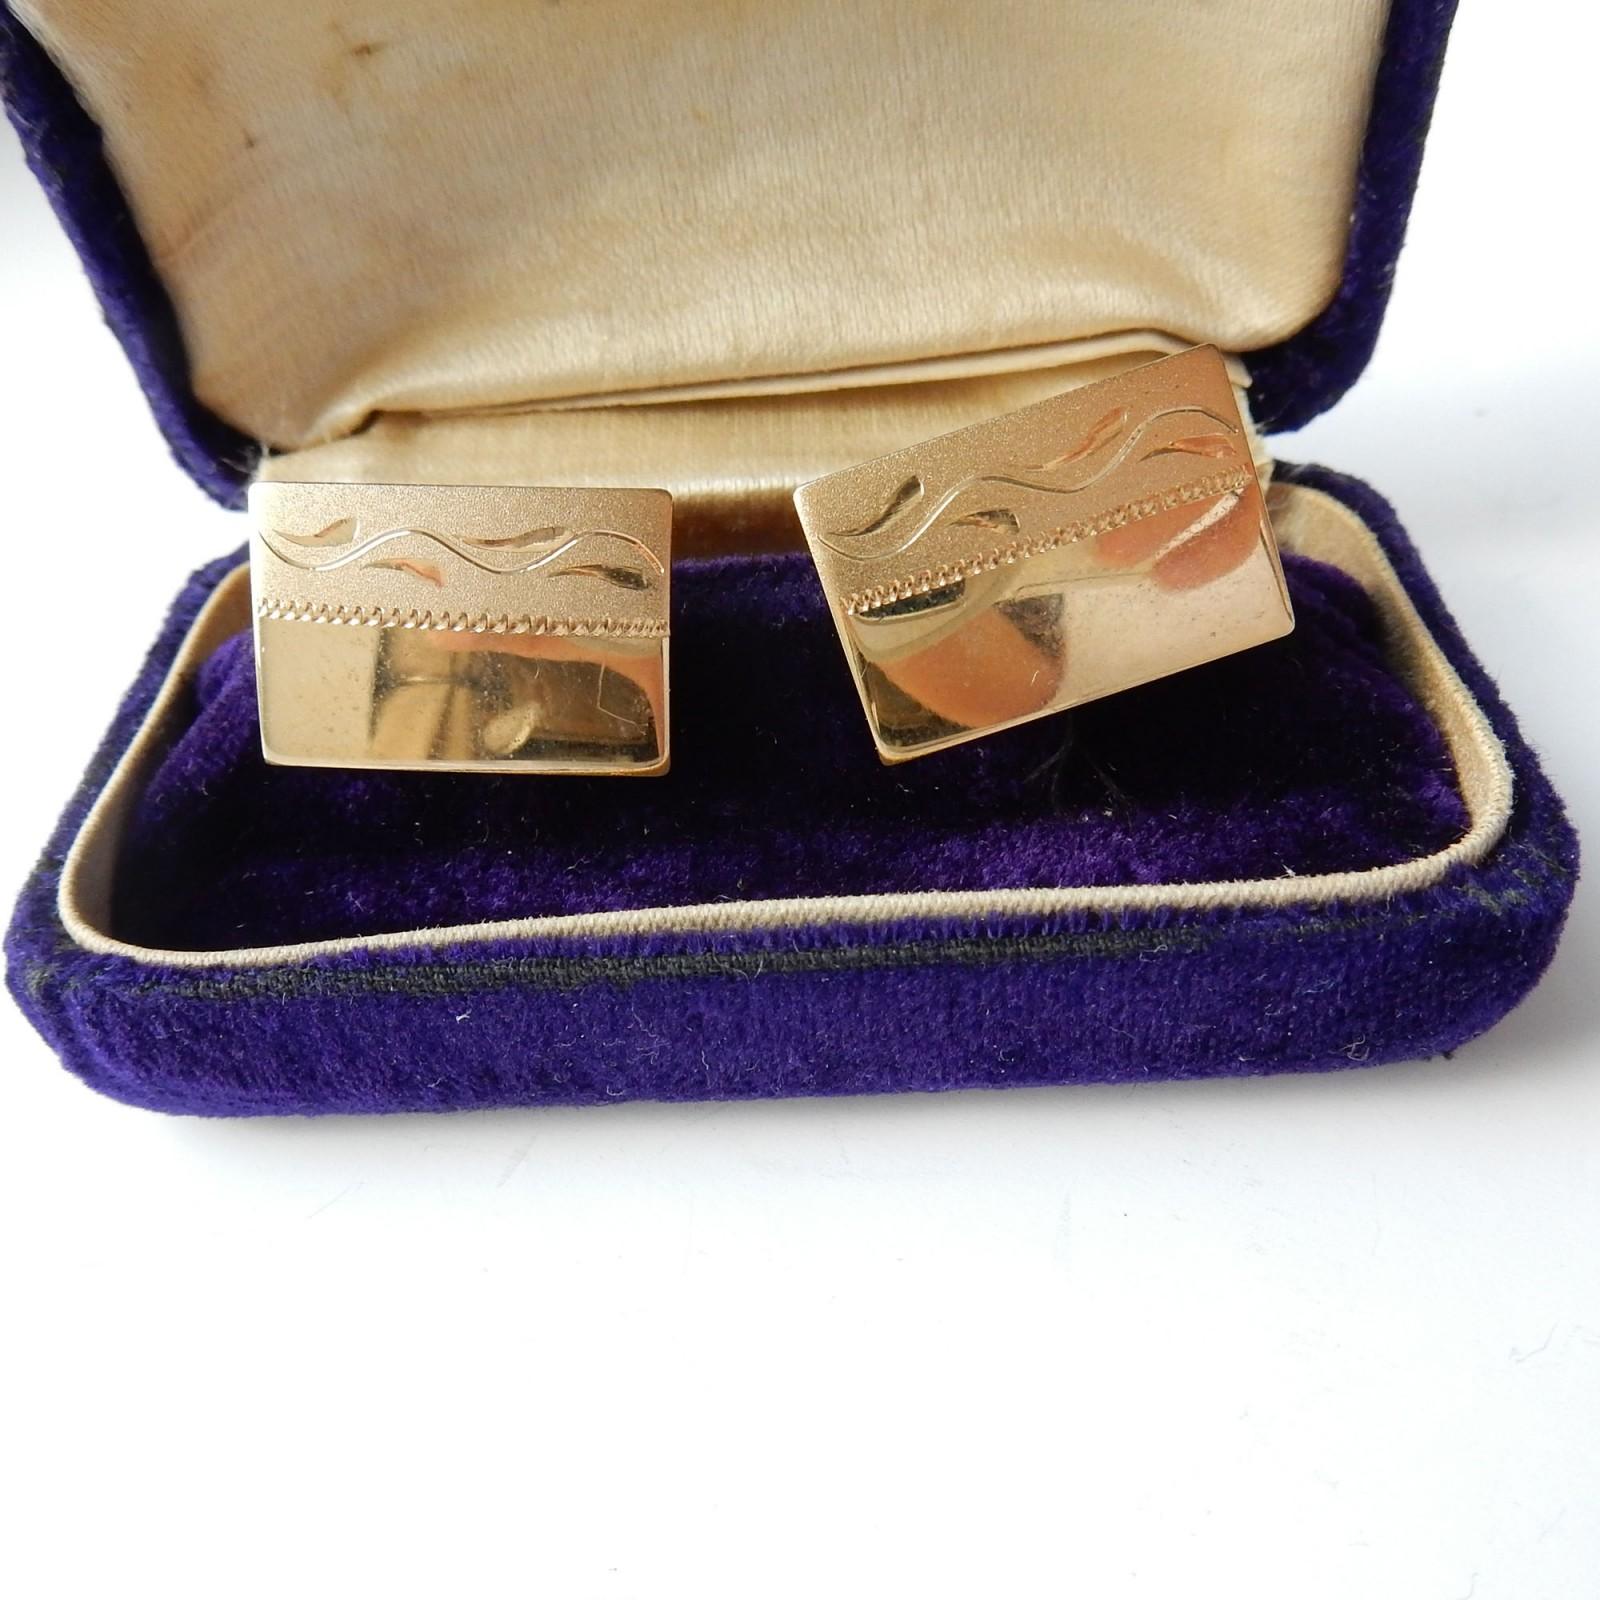 Photo of Vintage Gold Engraved Gentlemans Cufflinks Wedding Gift Accessory